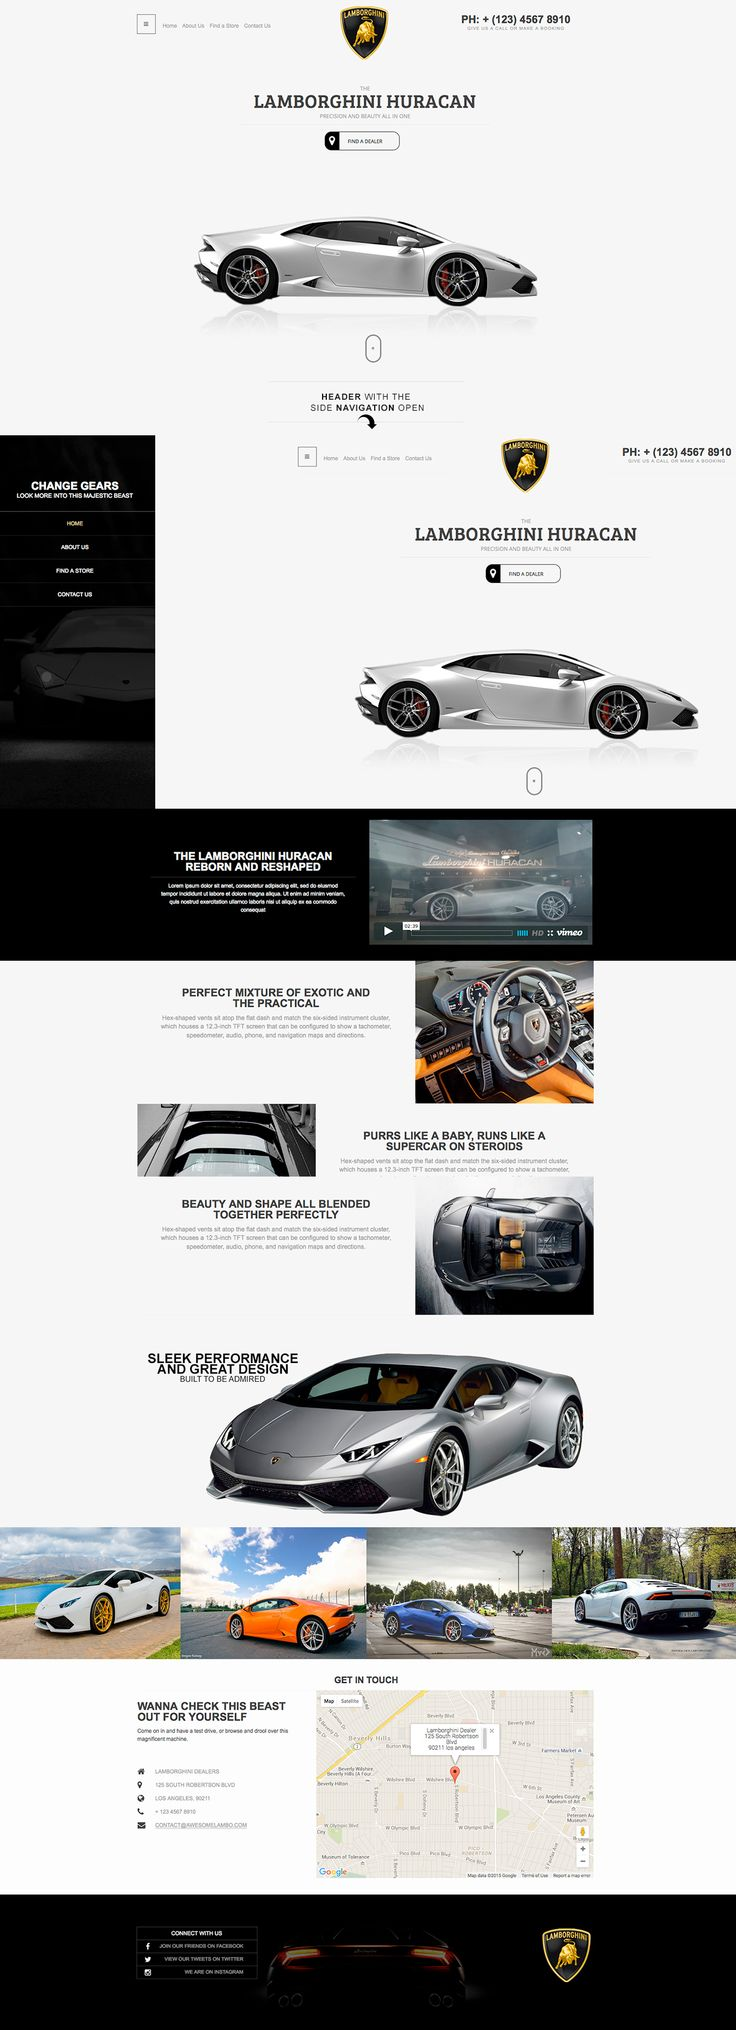 Lamborghini Homepage Mock-up on Behance